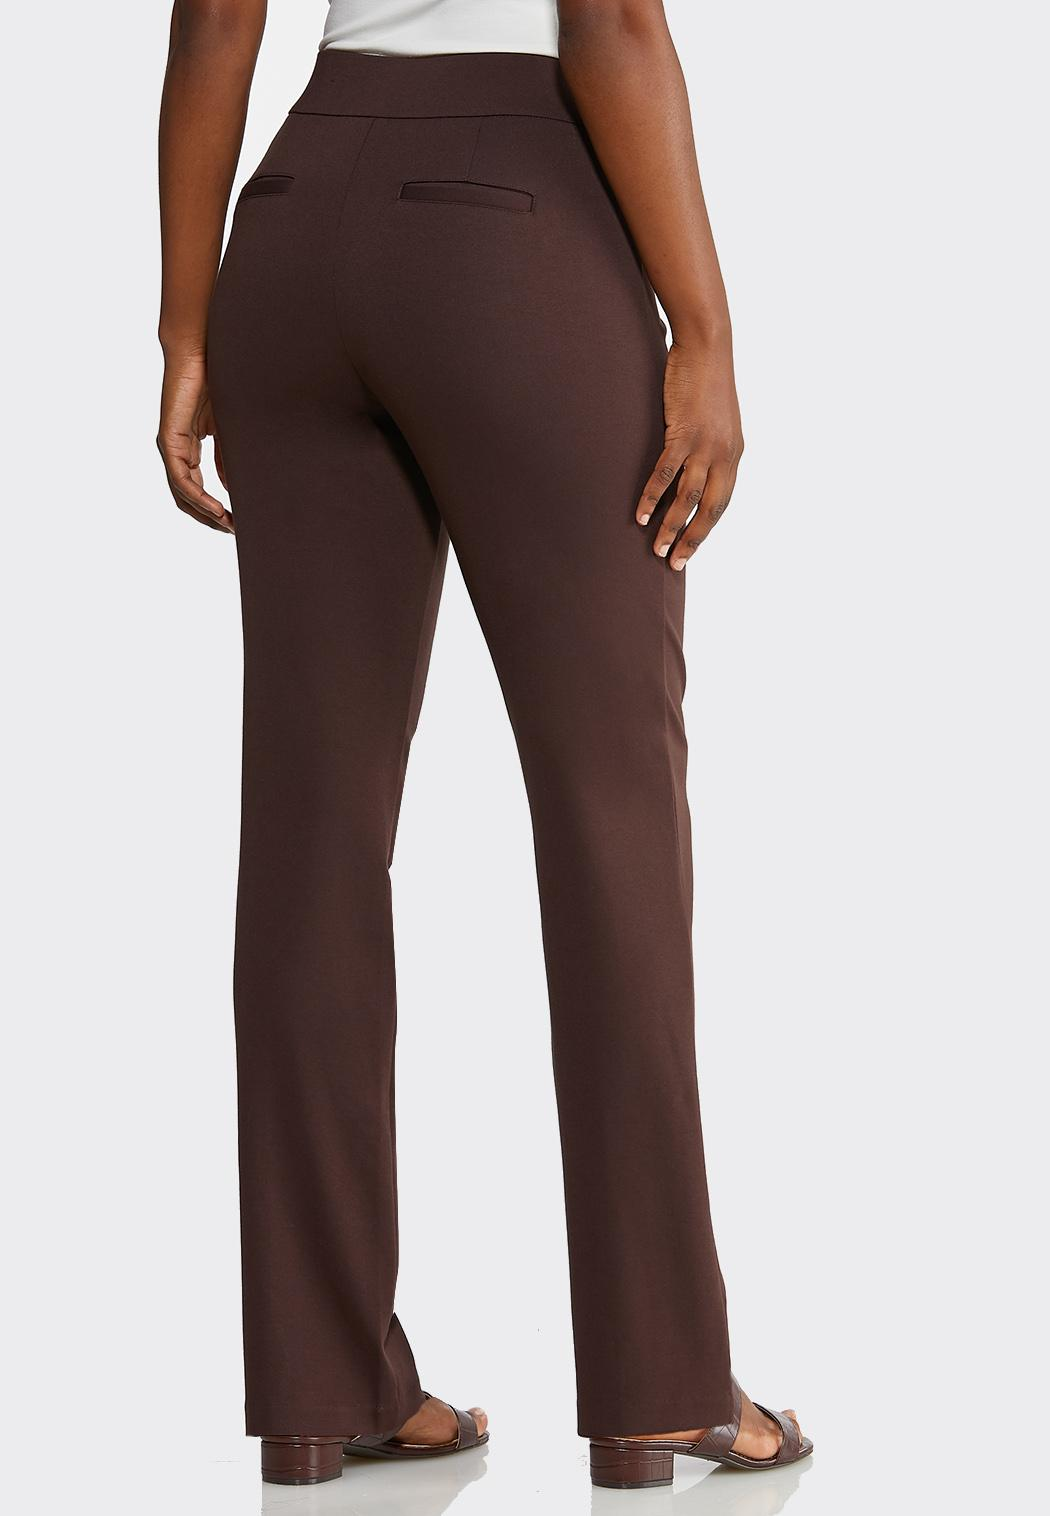 Pintuck Straight Leg Ponte Pants (Item #43918708)